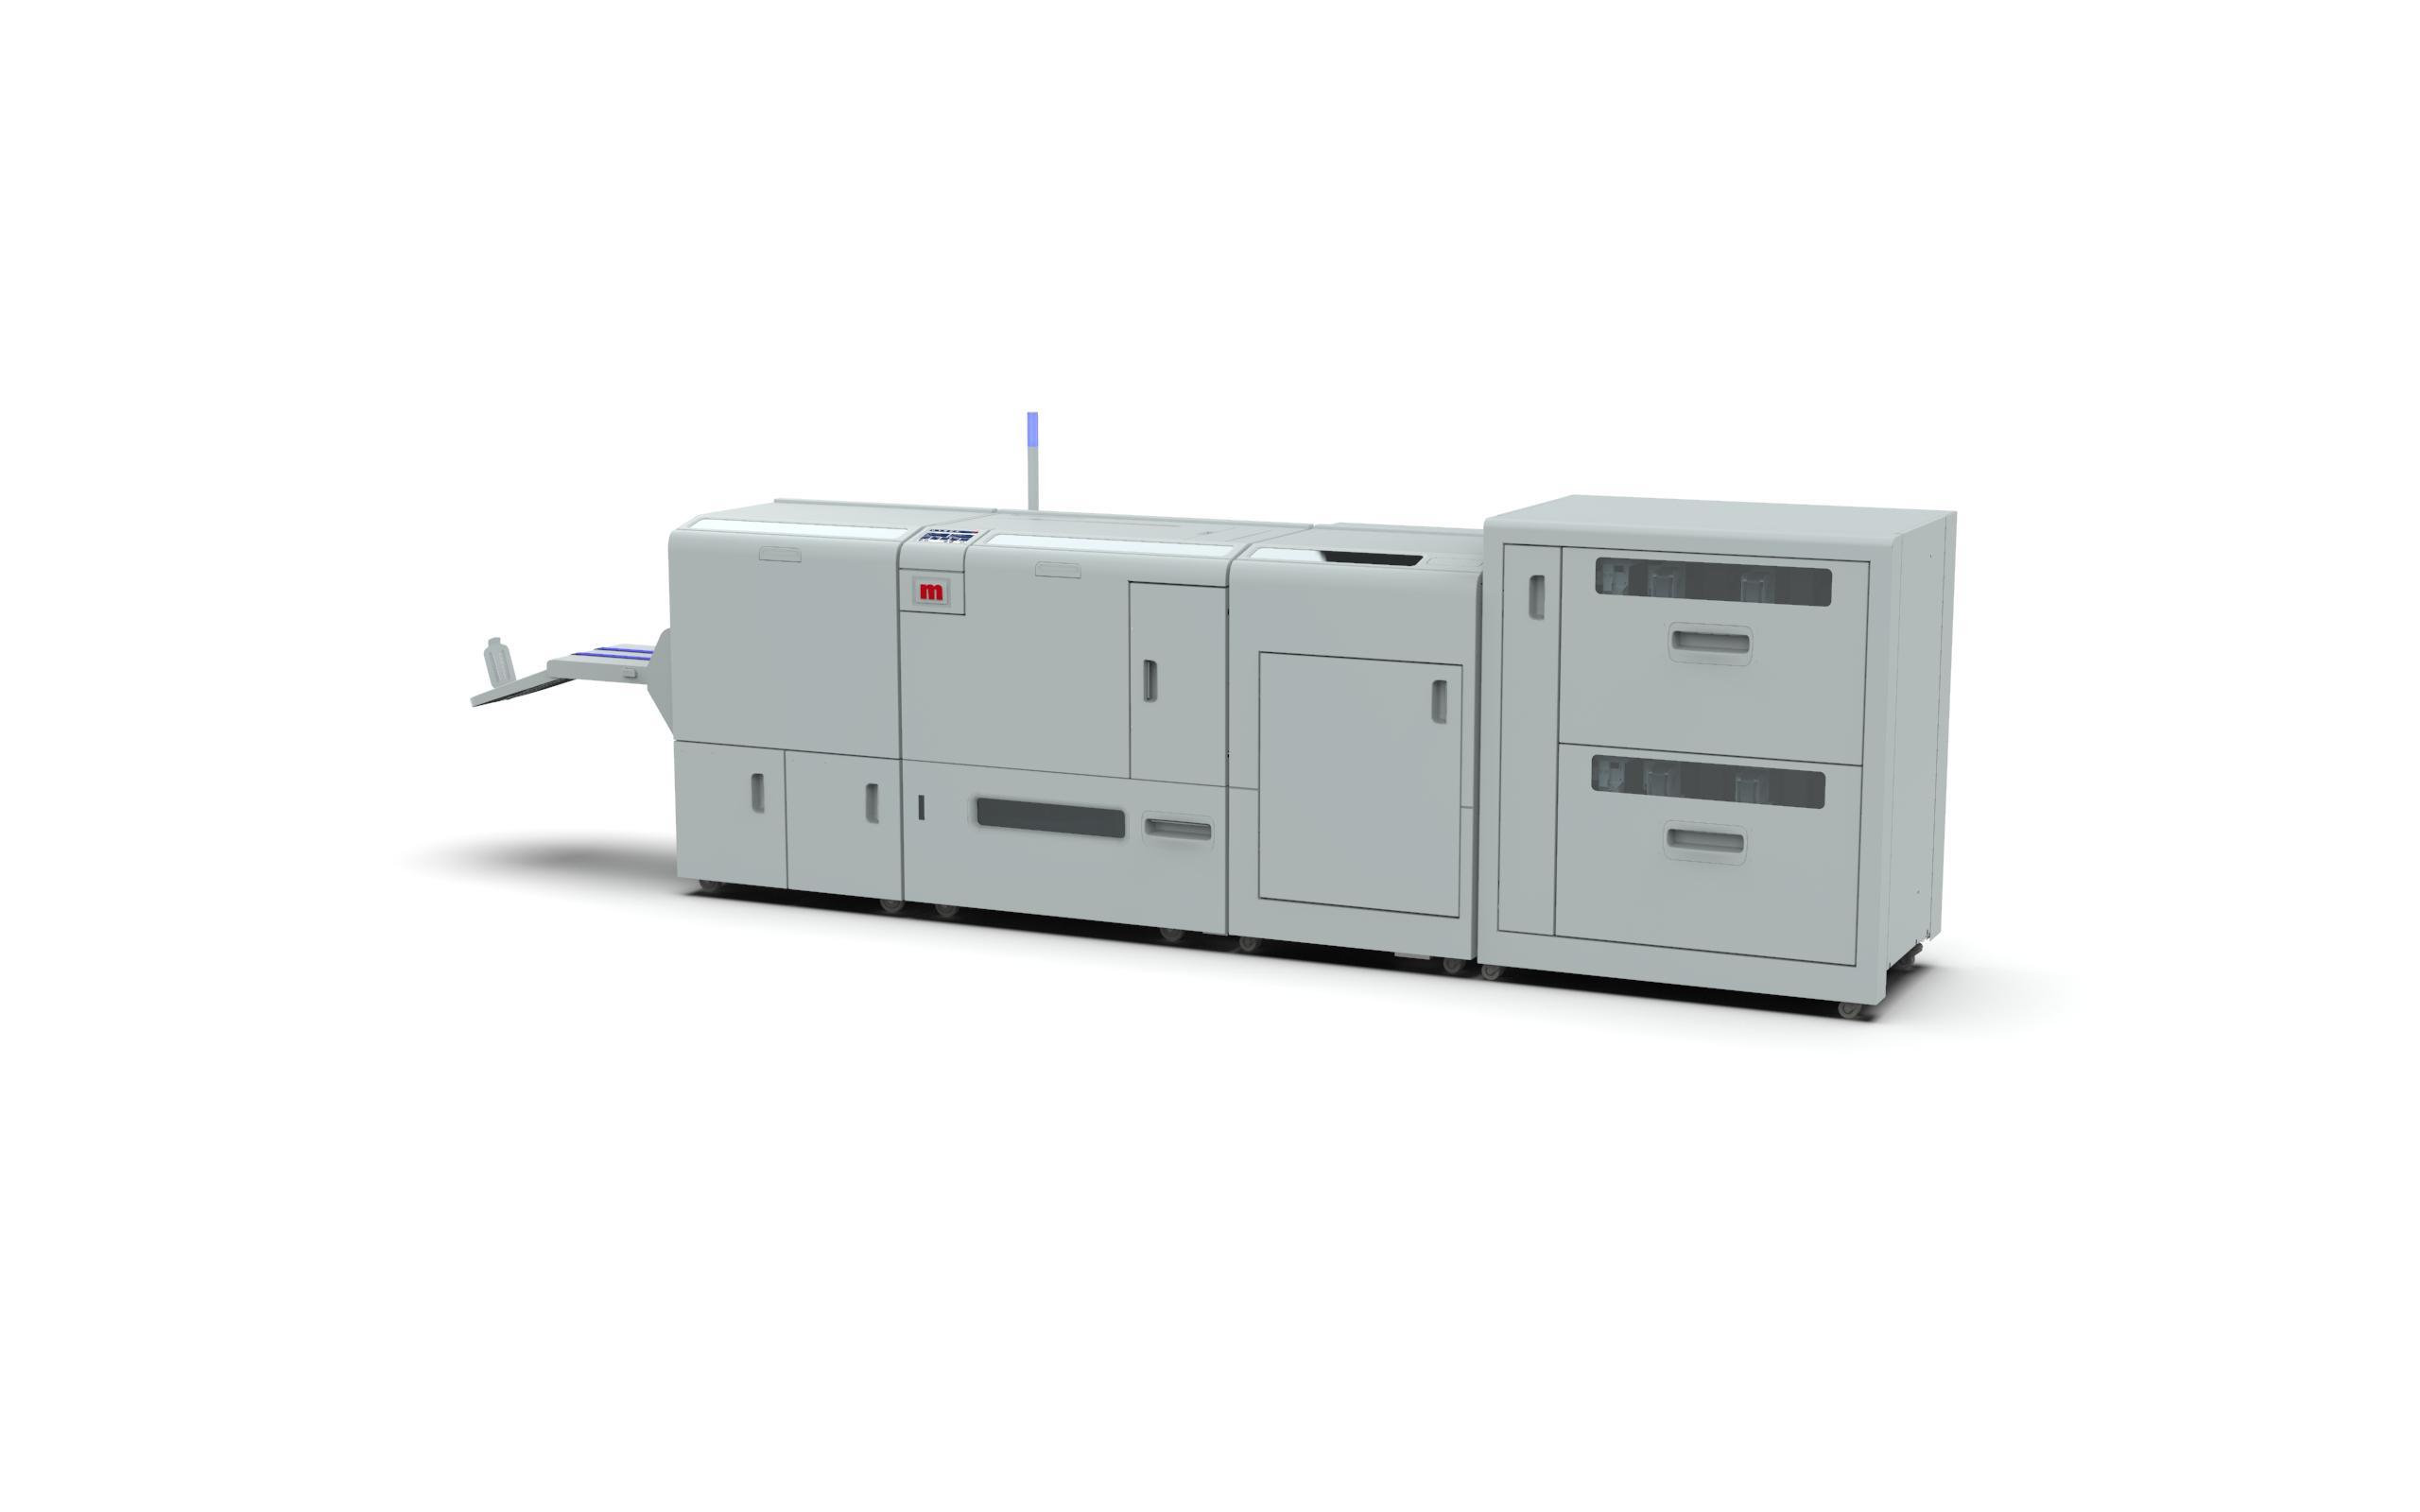 Plockmatic BM5000 Booklet maker